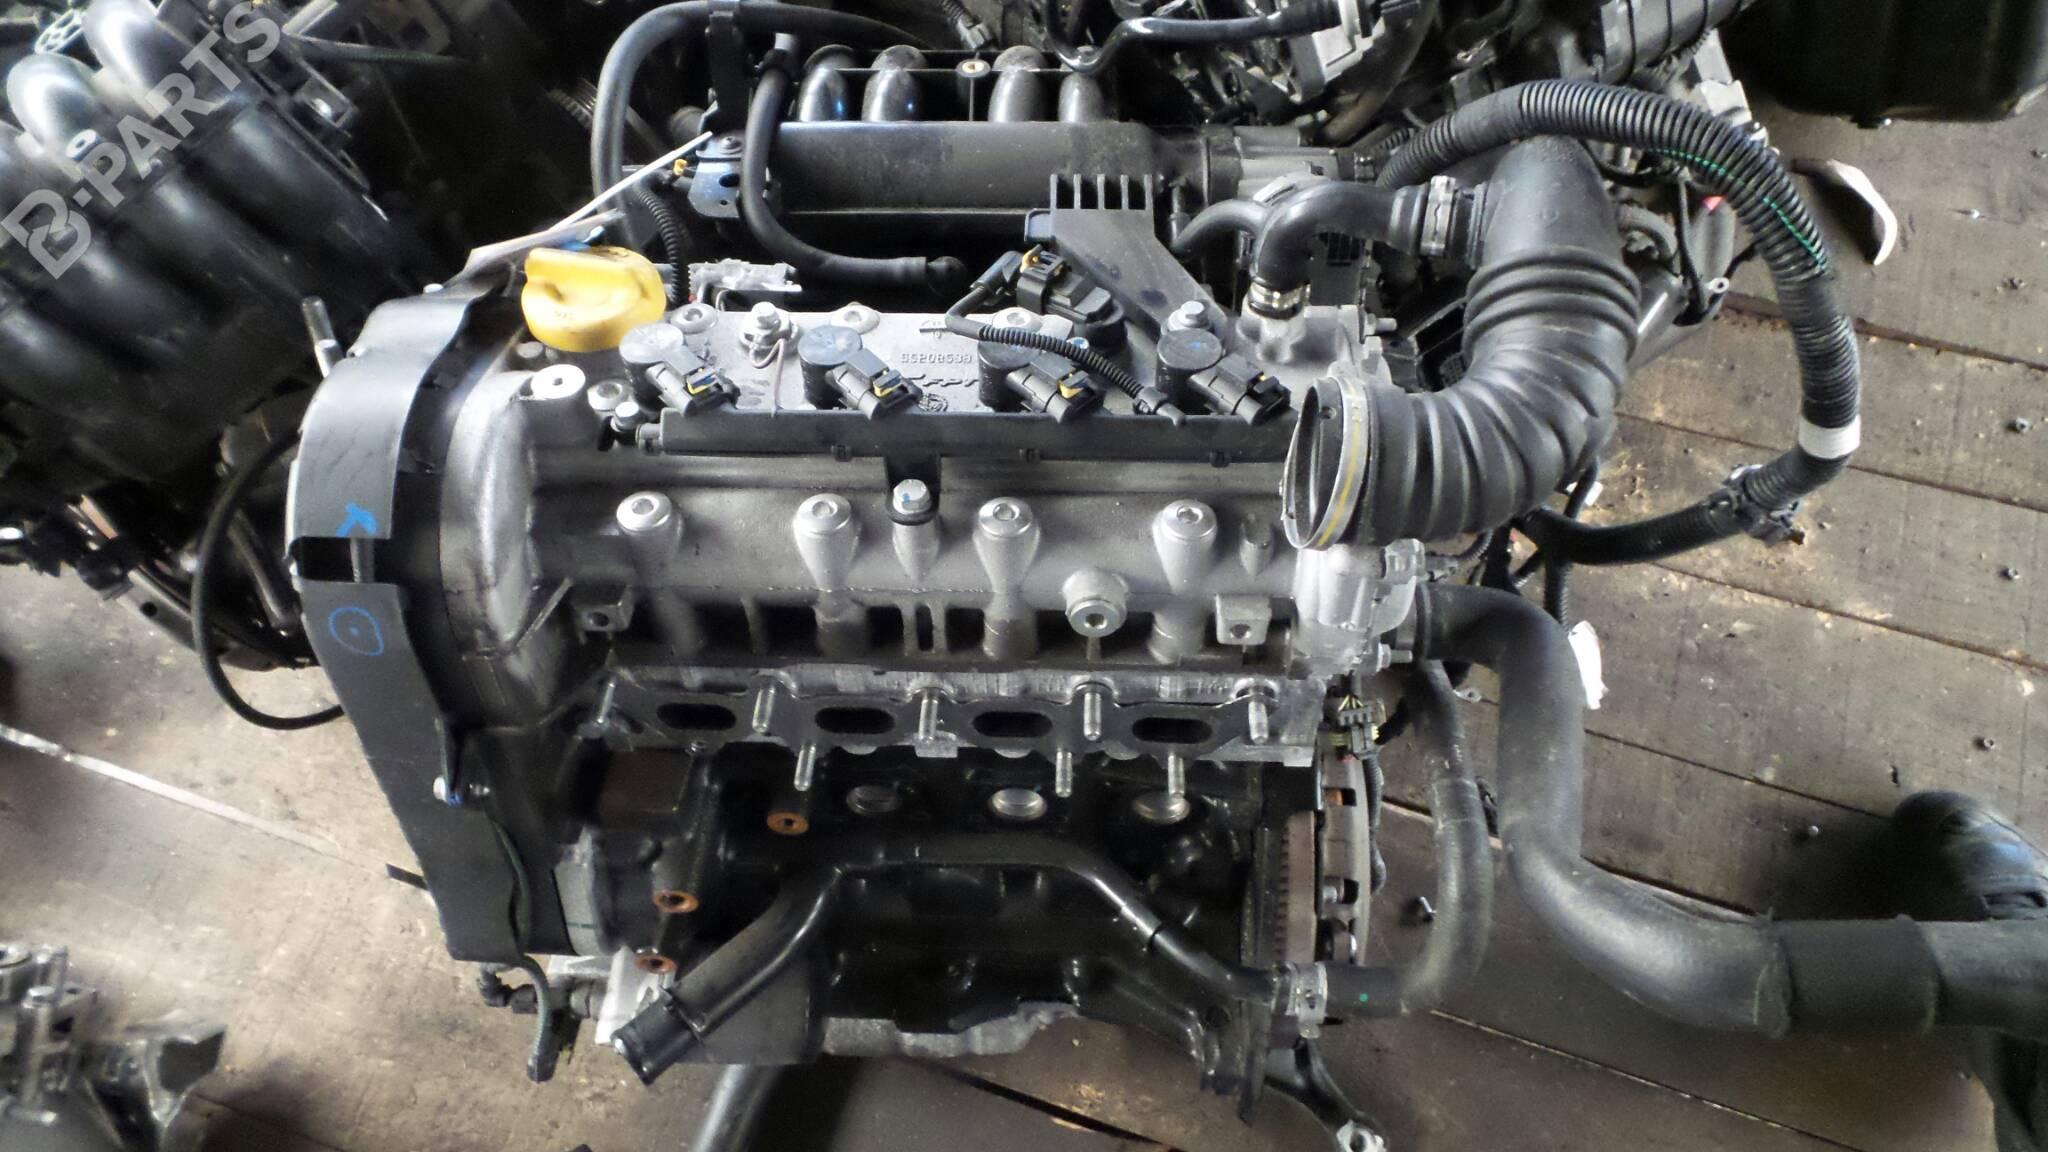 Engine Fiat Bravo Ii 198 14 198axa1b 10165 Fuse Box 2007 Complete 192b2000 90hp